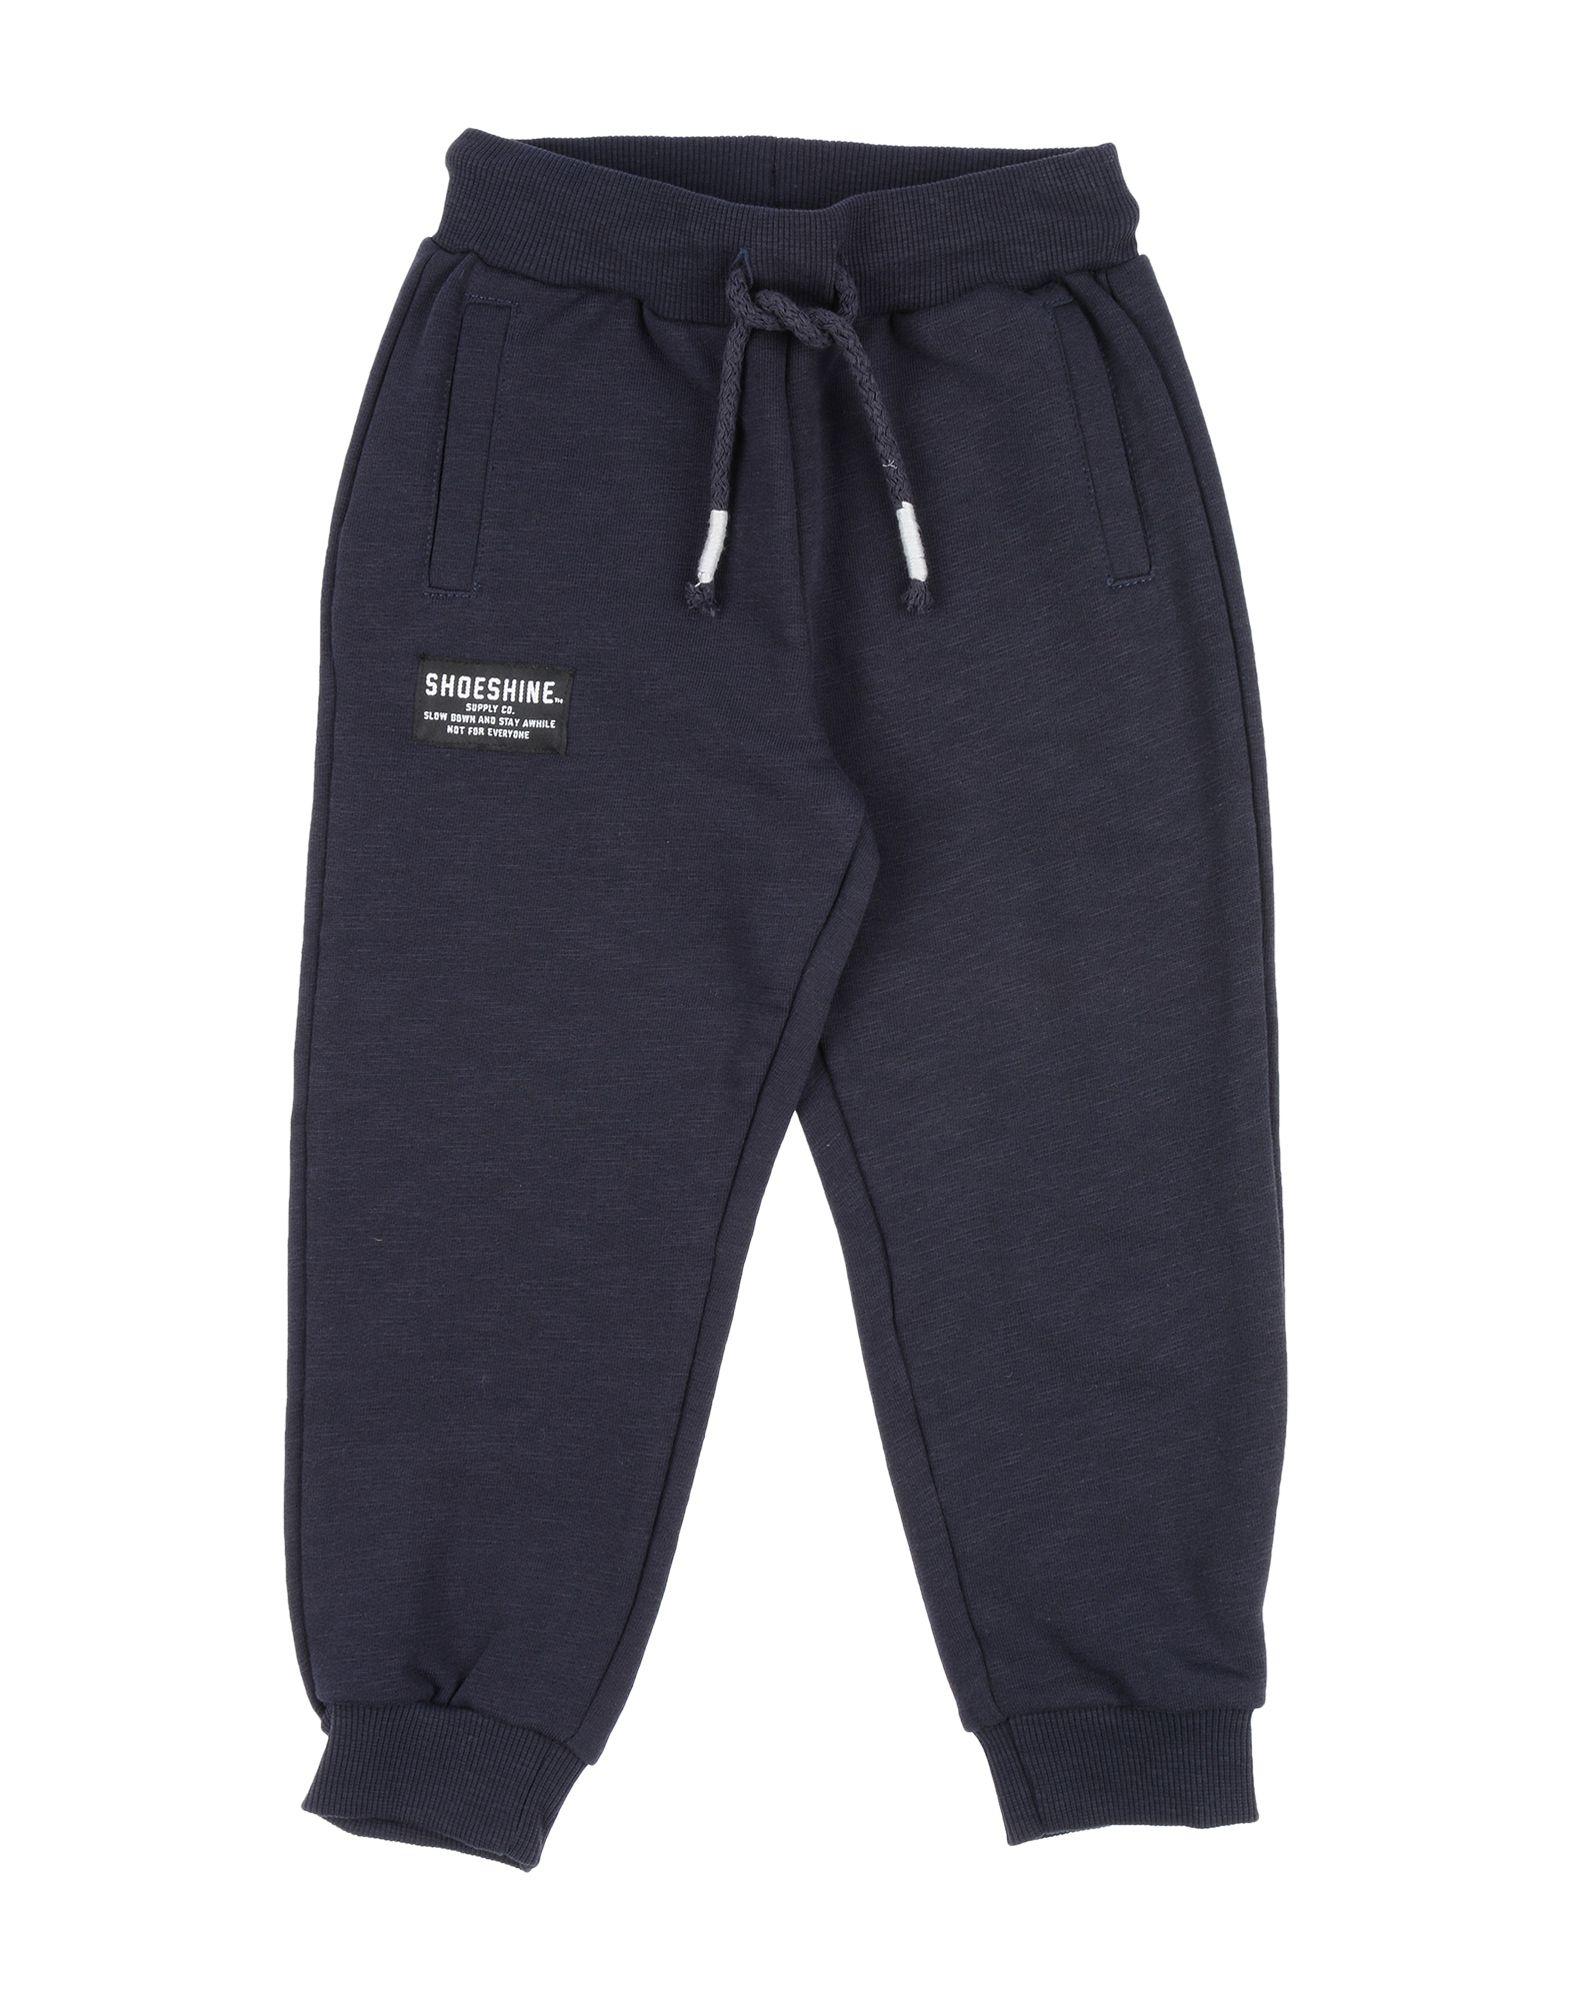 Shoeshine Kids' Casual Pants In Dark Blue